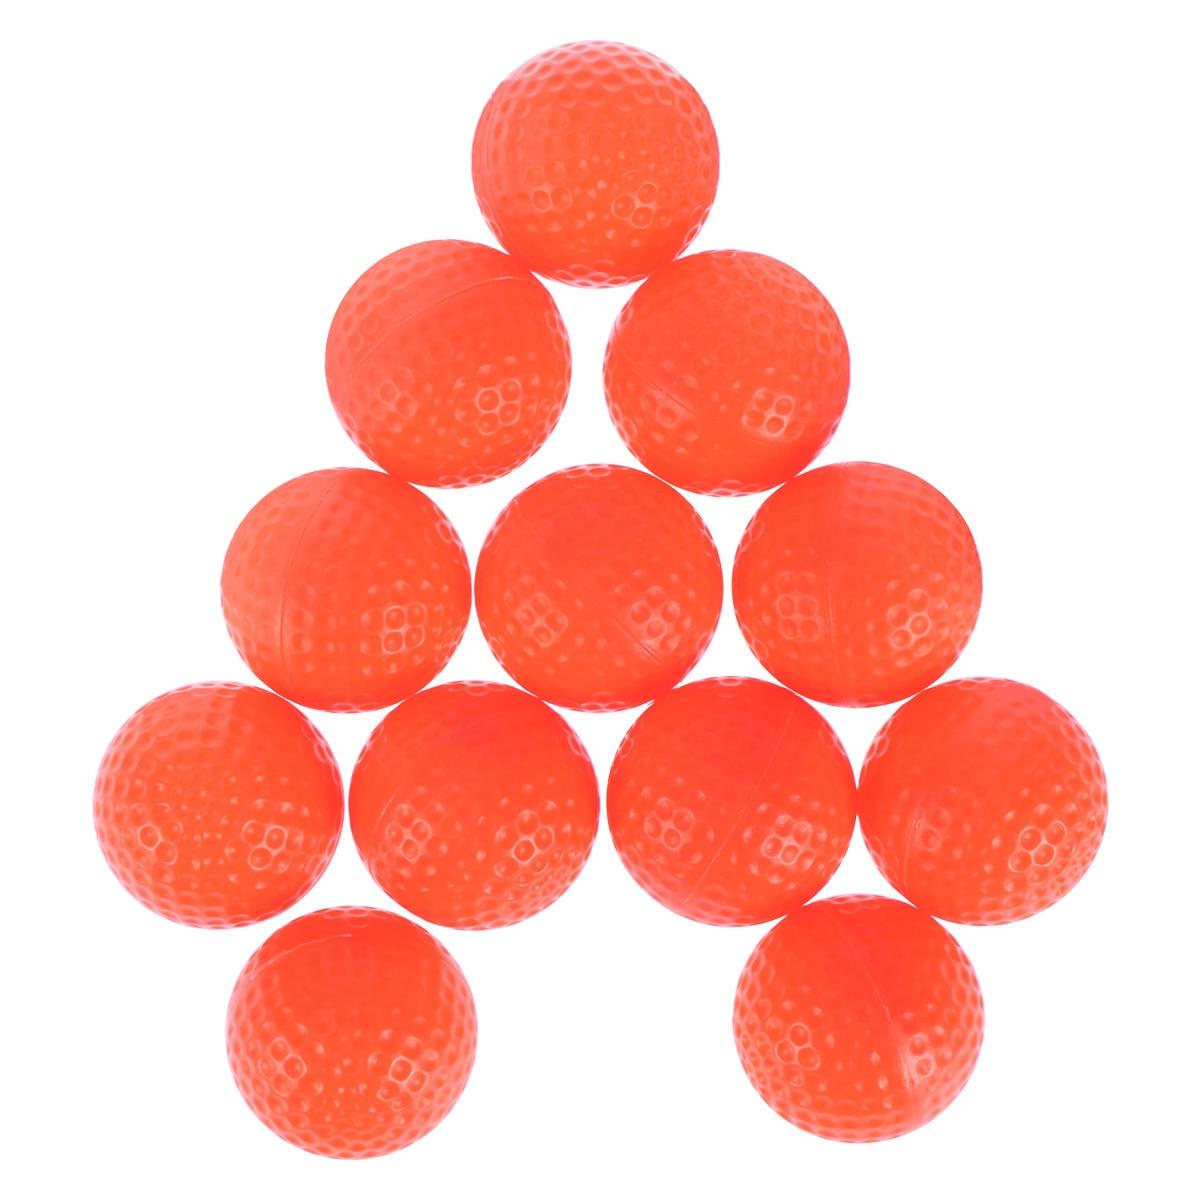 12pcs Practical Exercise Field Balls Indoor Practice Training Aids PU Foam Golf Balls For Practical